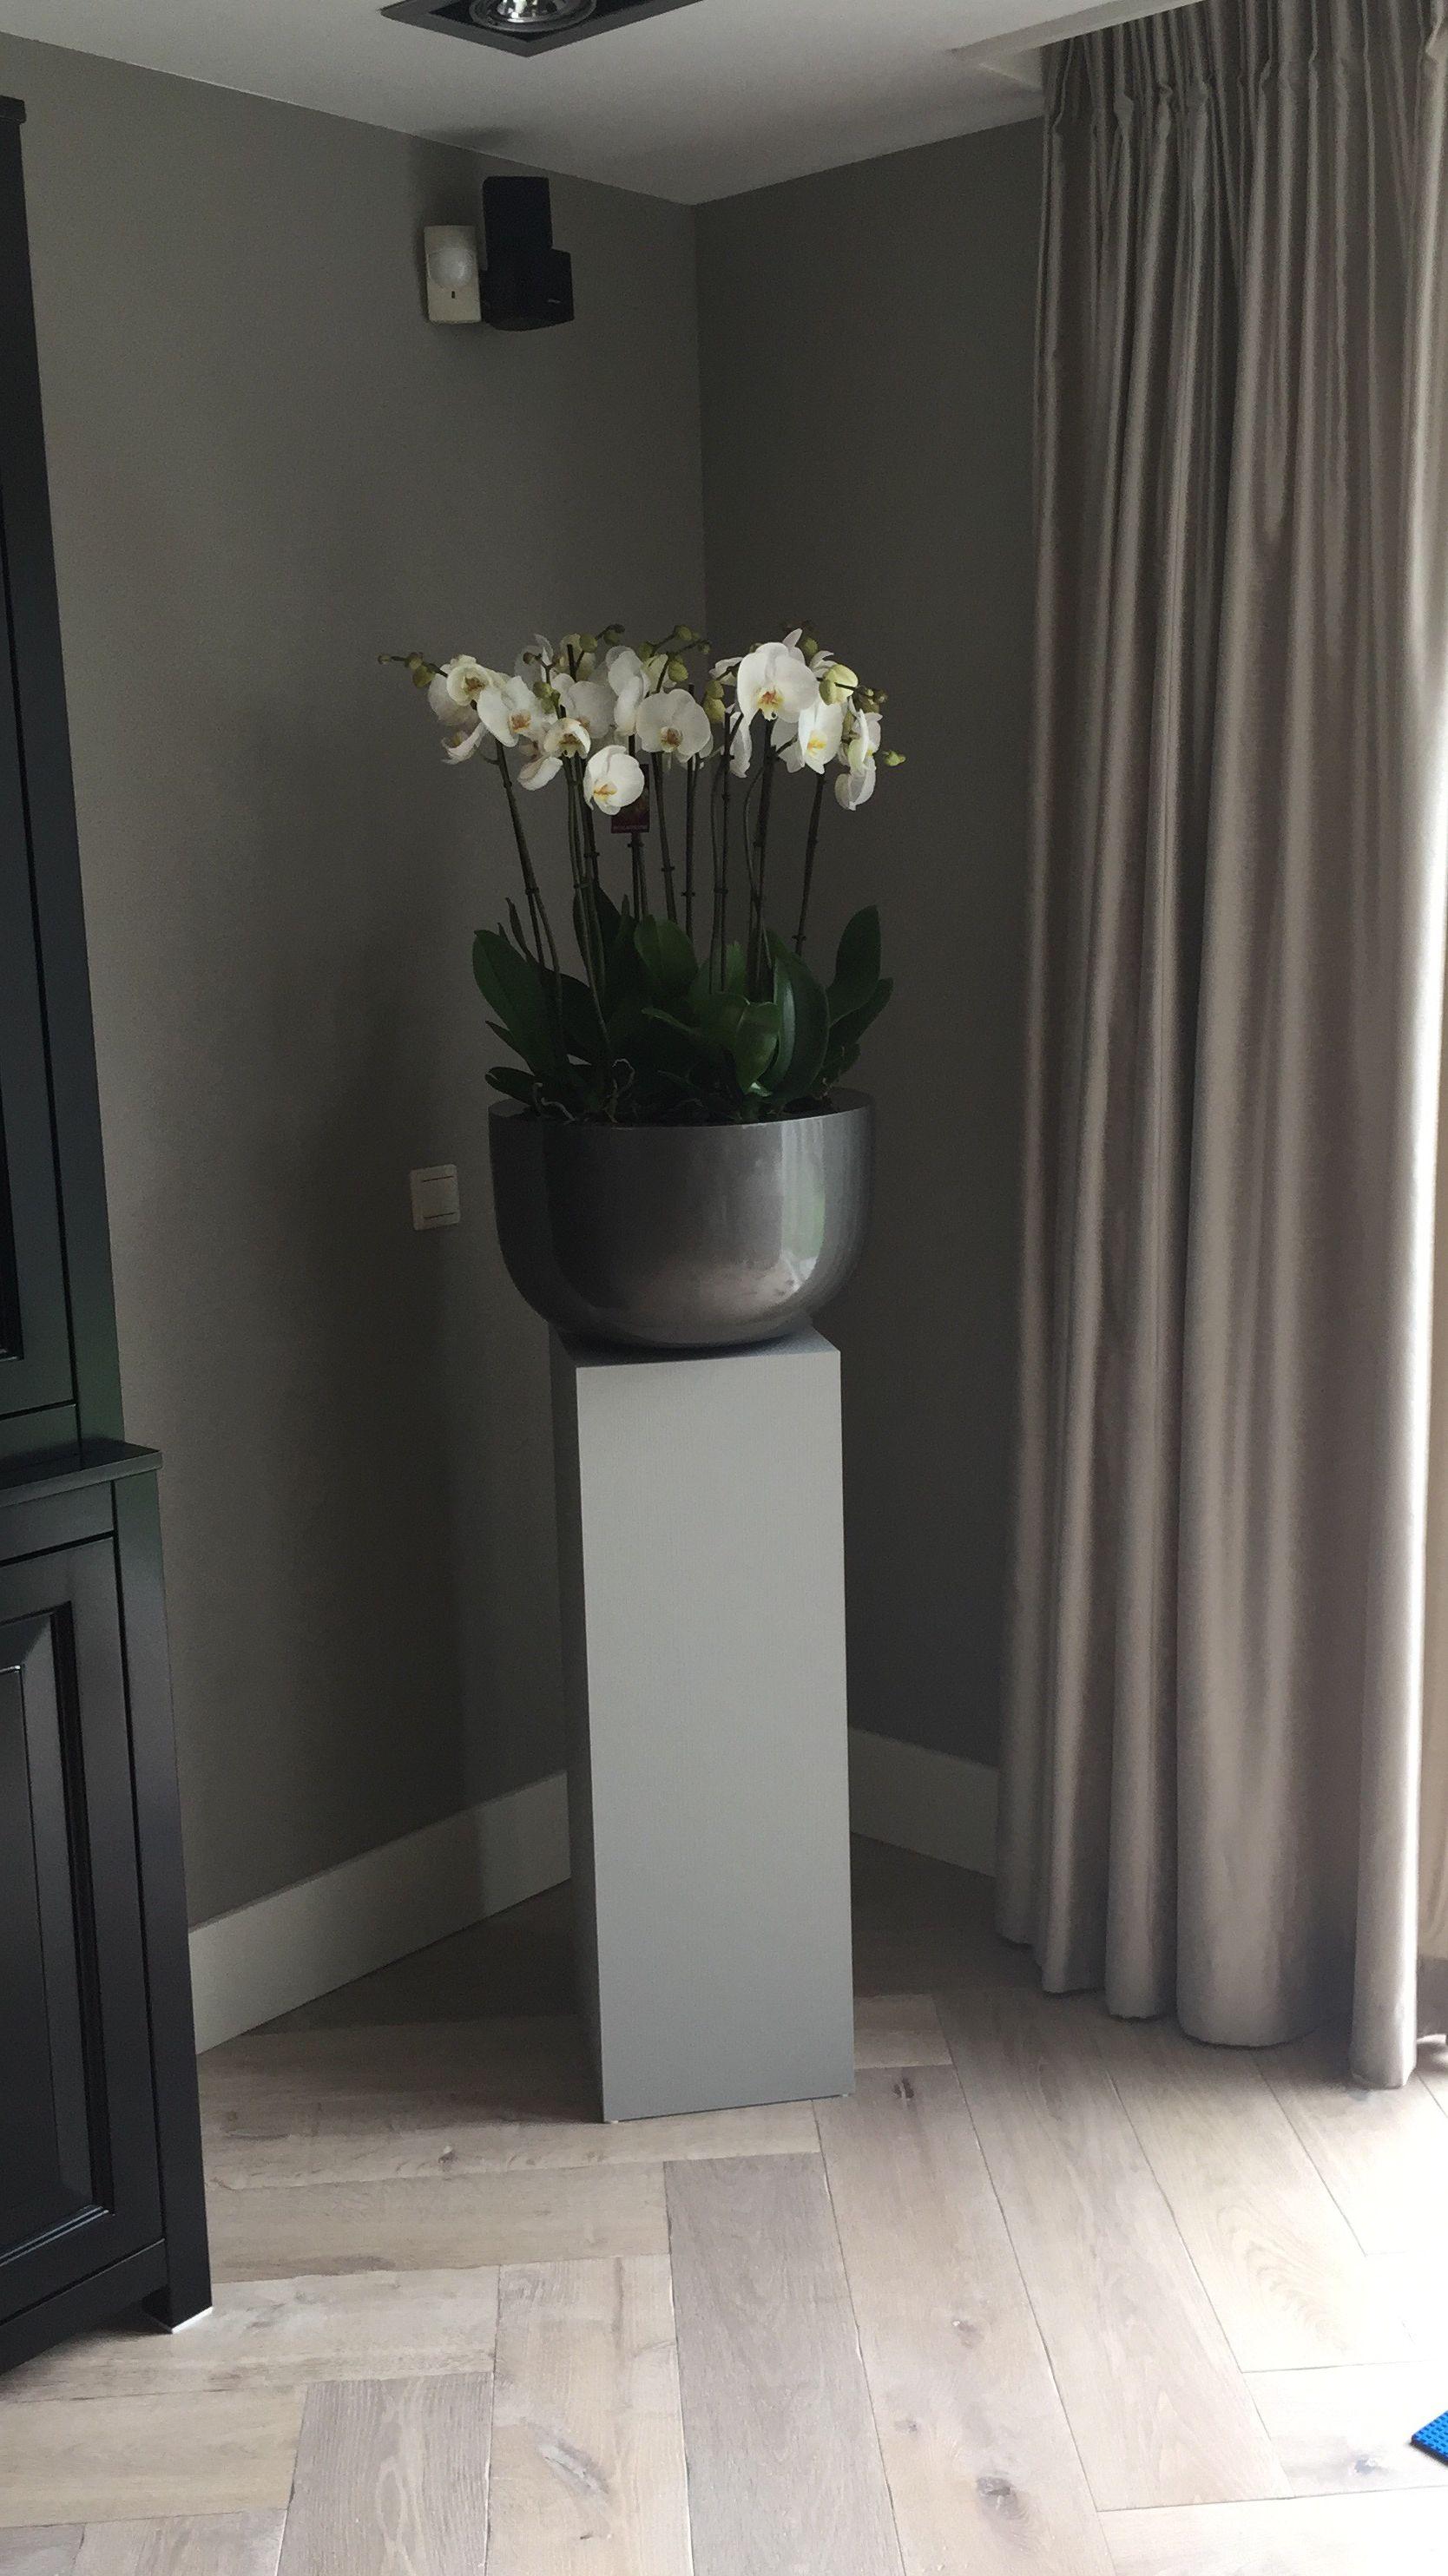 Pot Op Sokkel Phalaenopsis Pilaar Styling Woonkamer Huis Interieur Interieur Woonkamer Woonkamer Decoratie